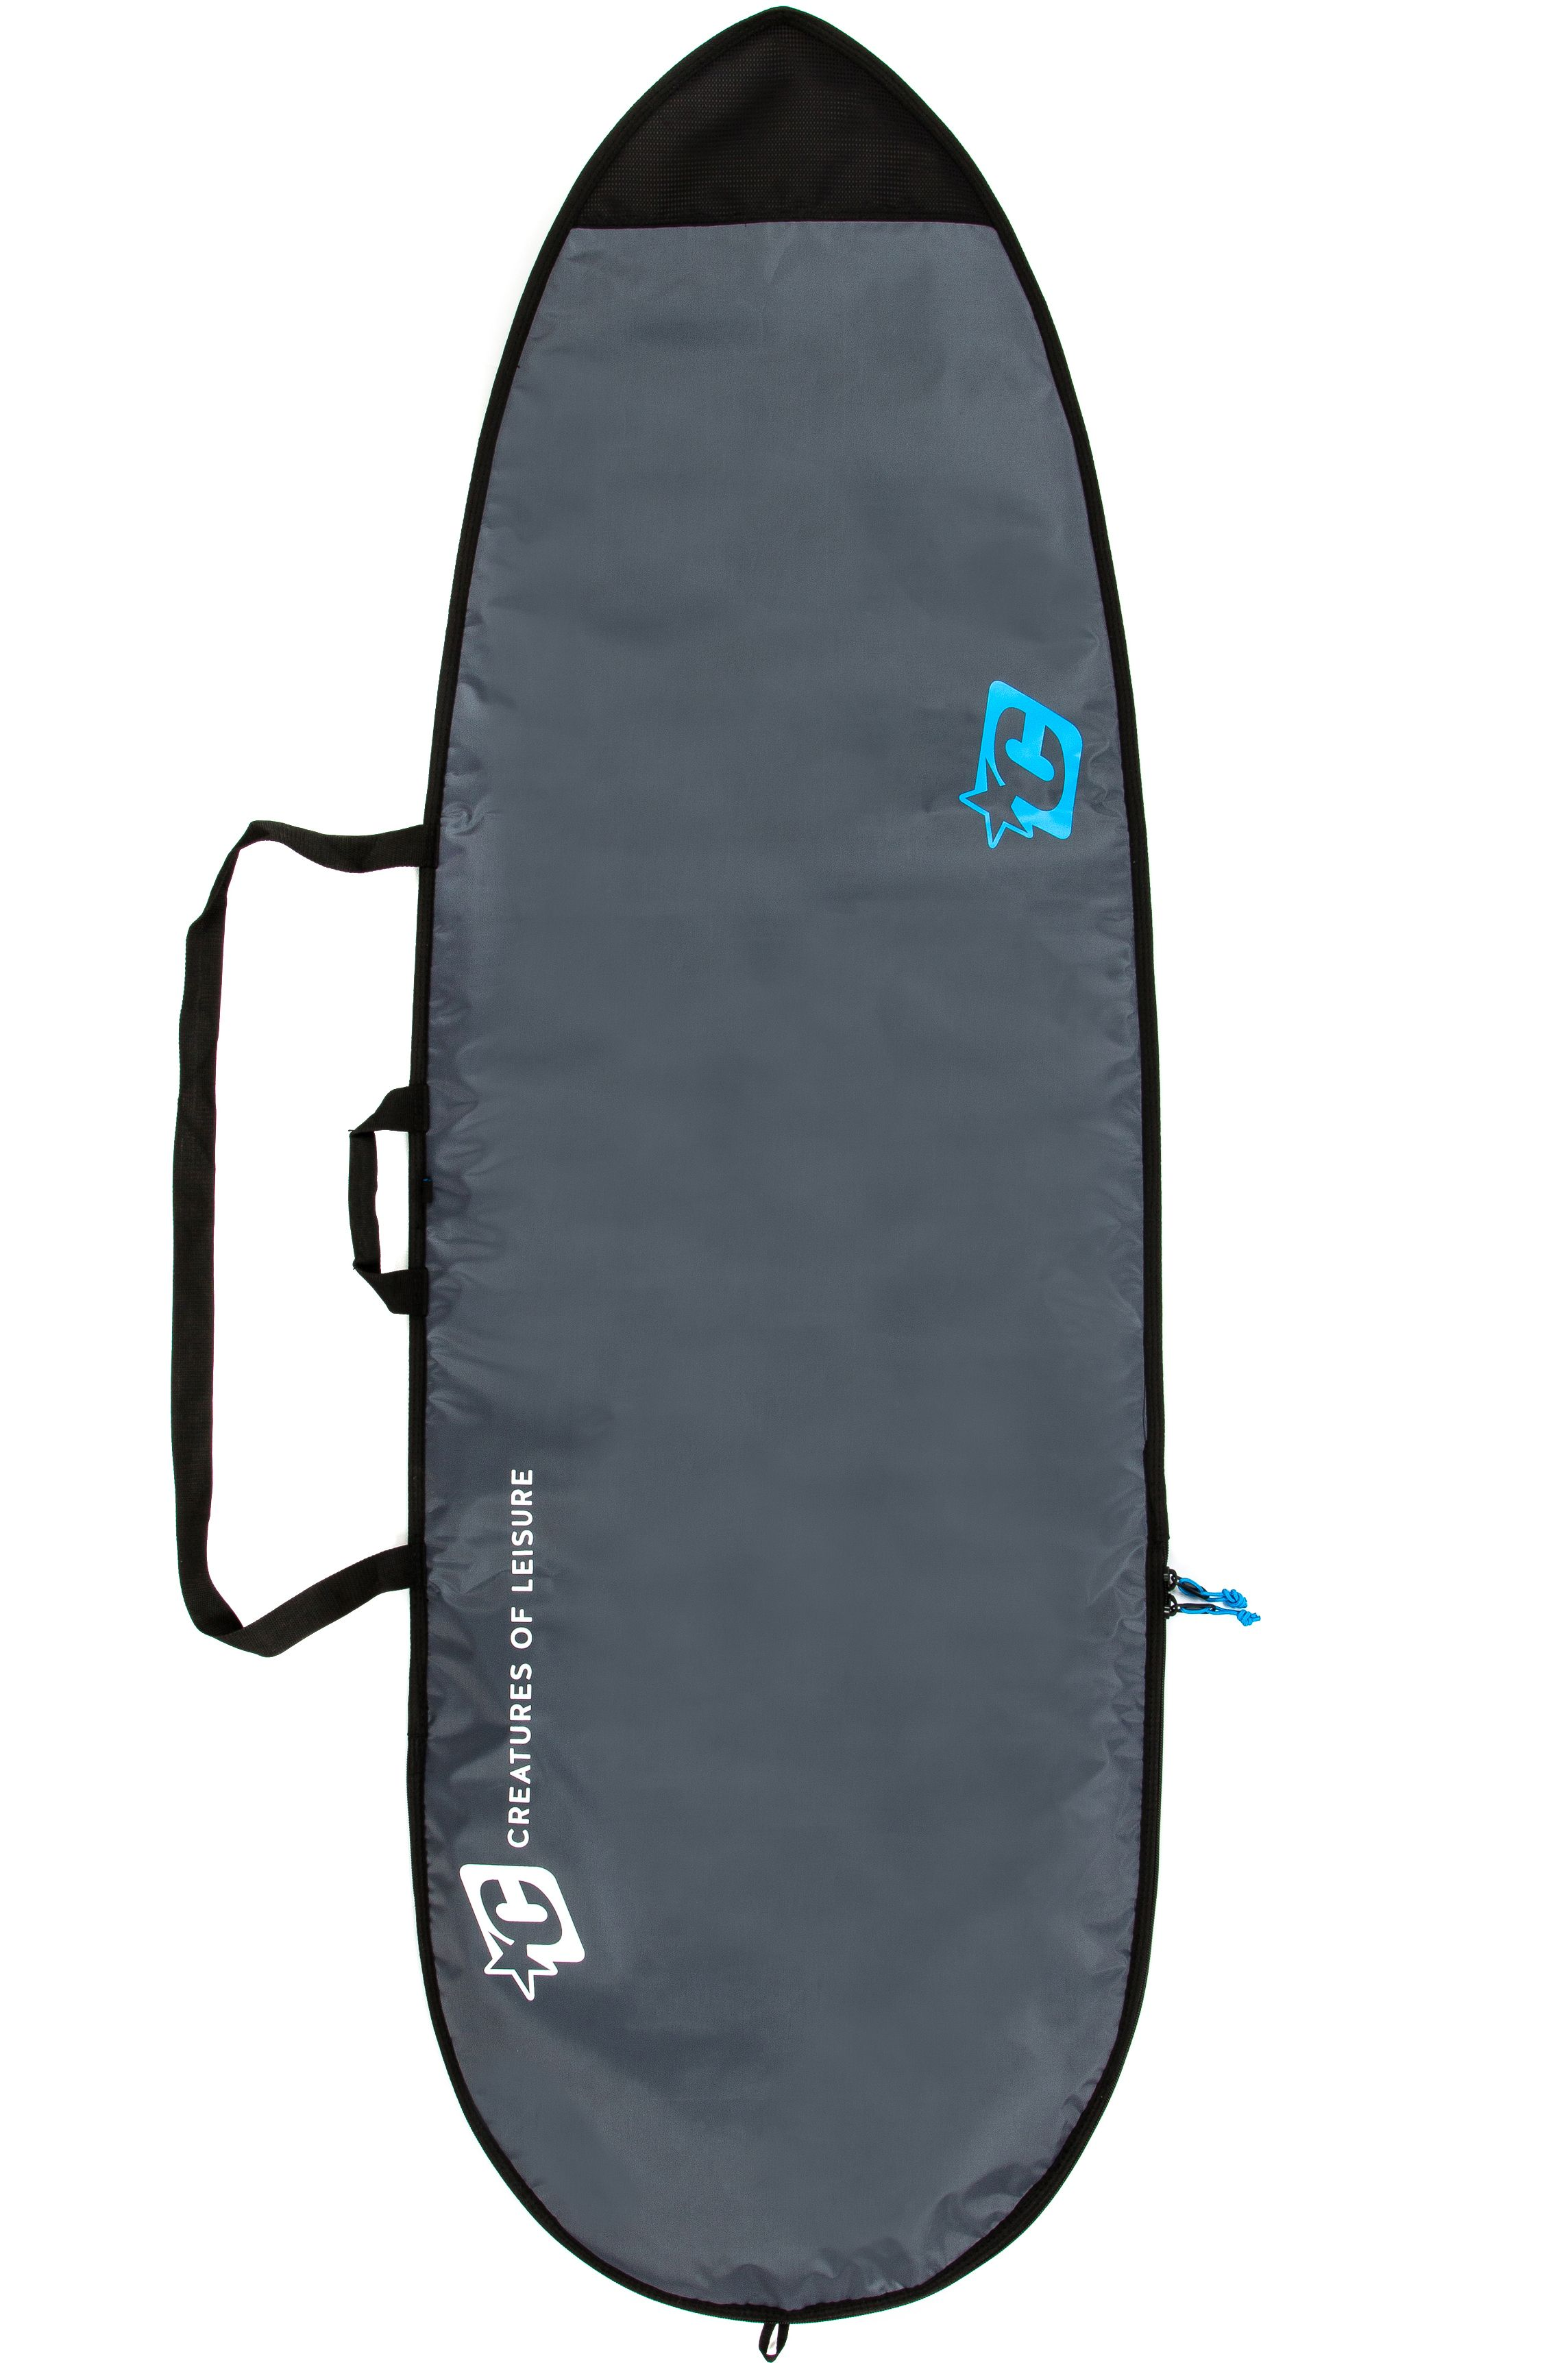 Creatures Boardbag 5'10 FISH LITE Charcoal Cyan